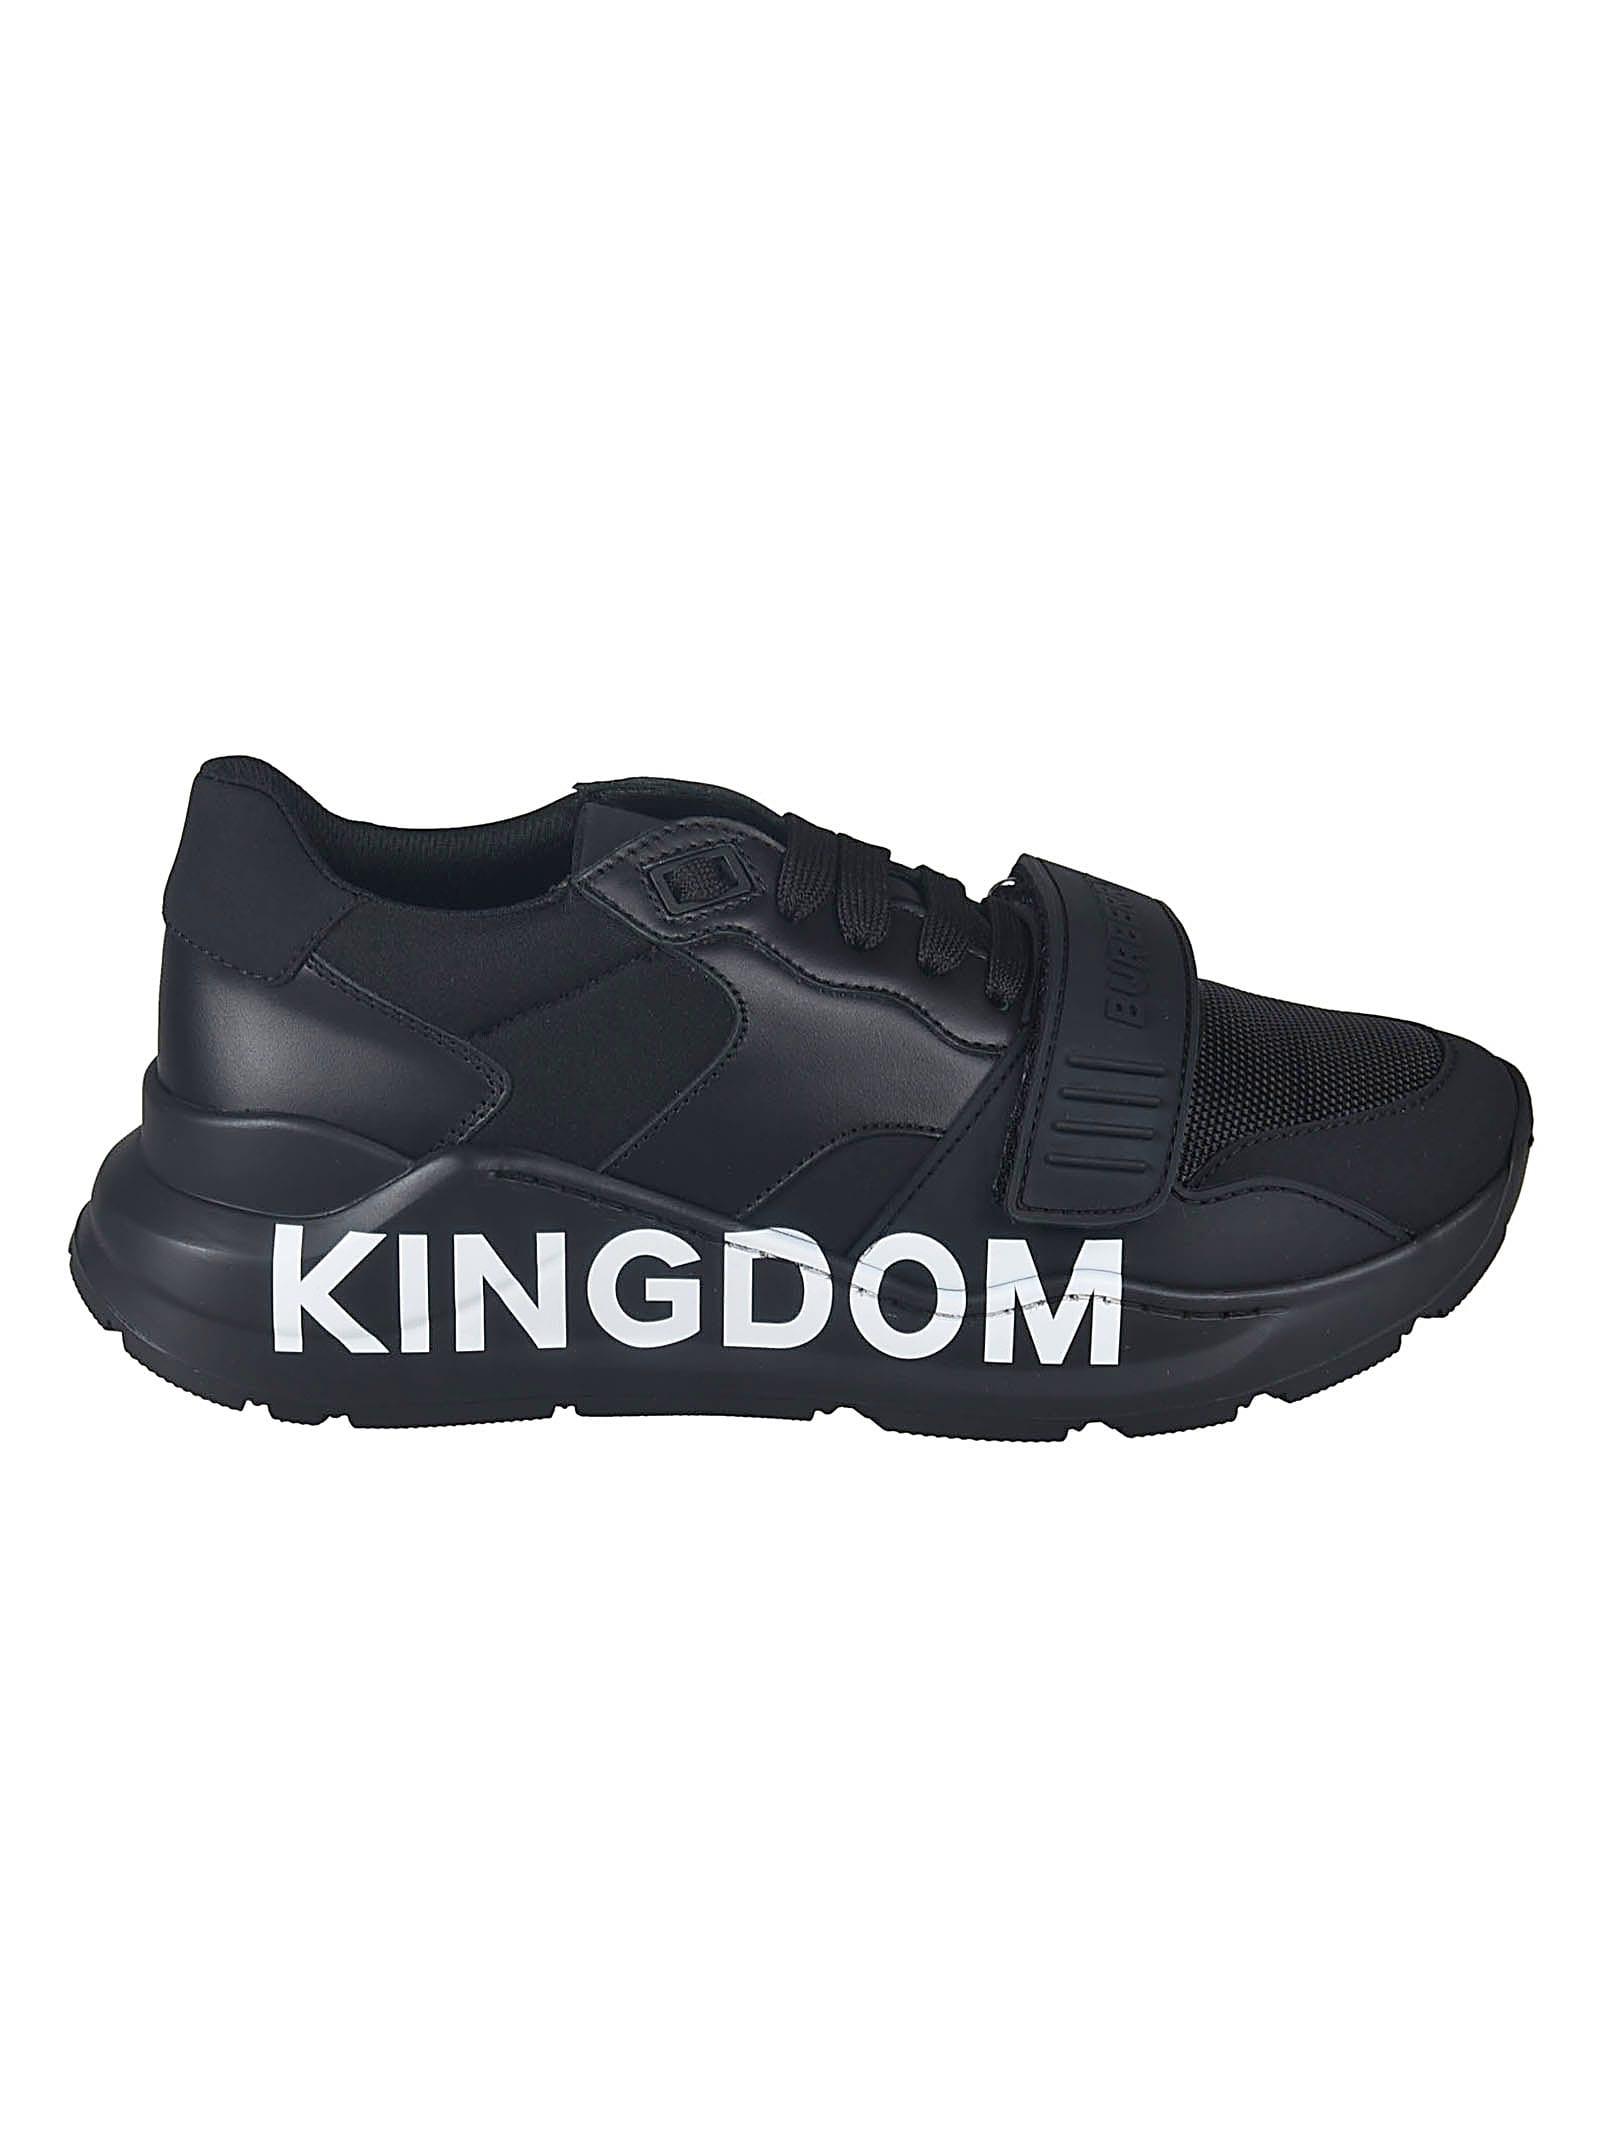 Burberry Burberry Sneakers - Black